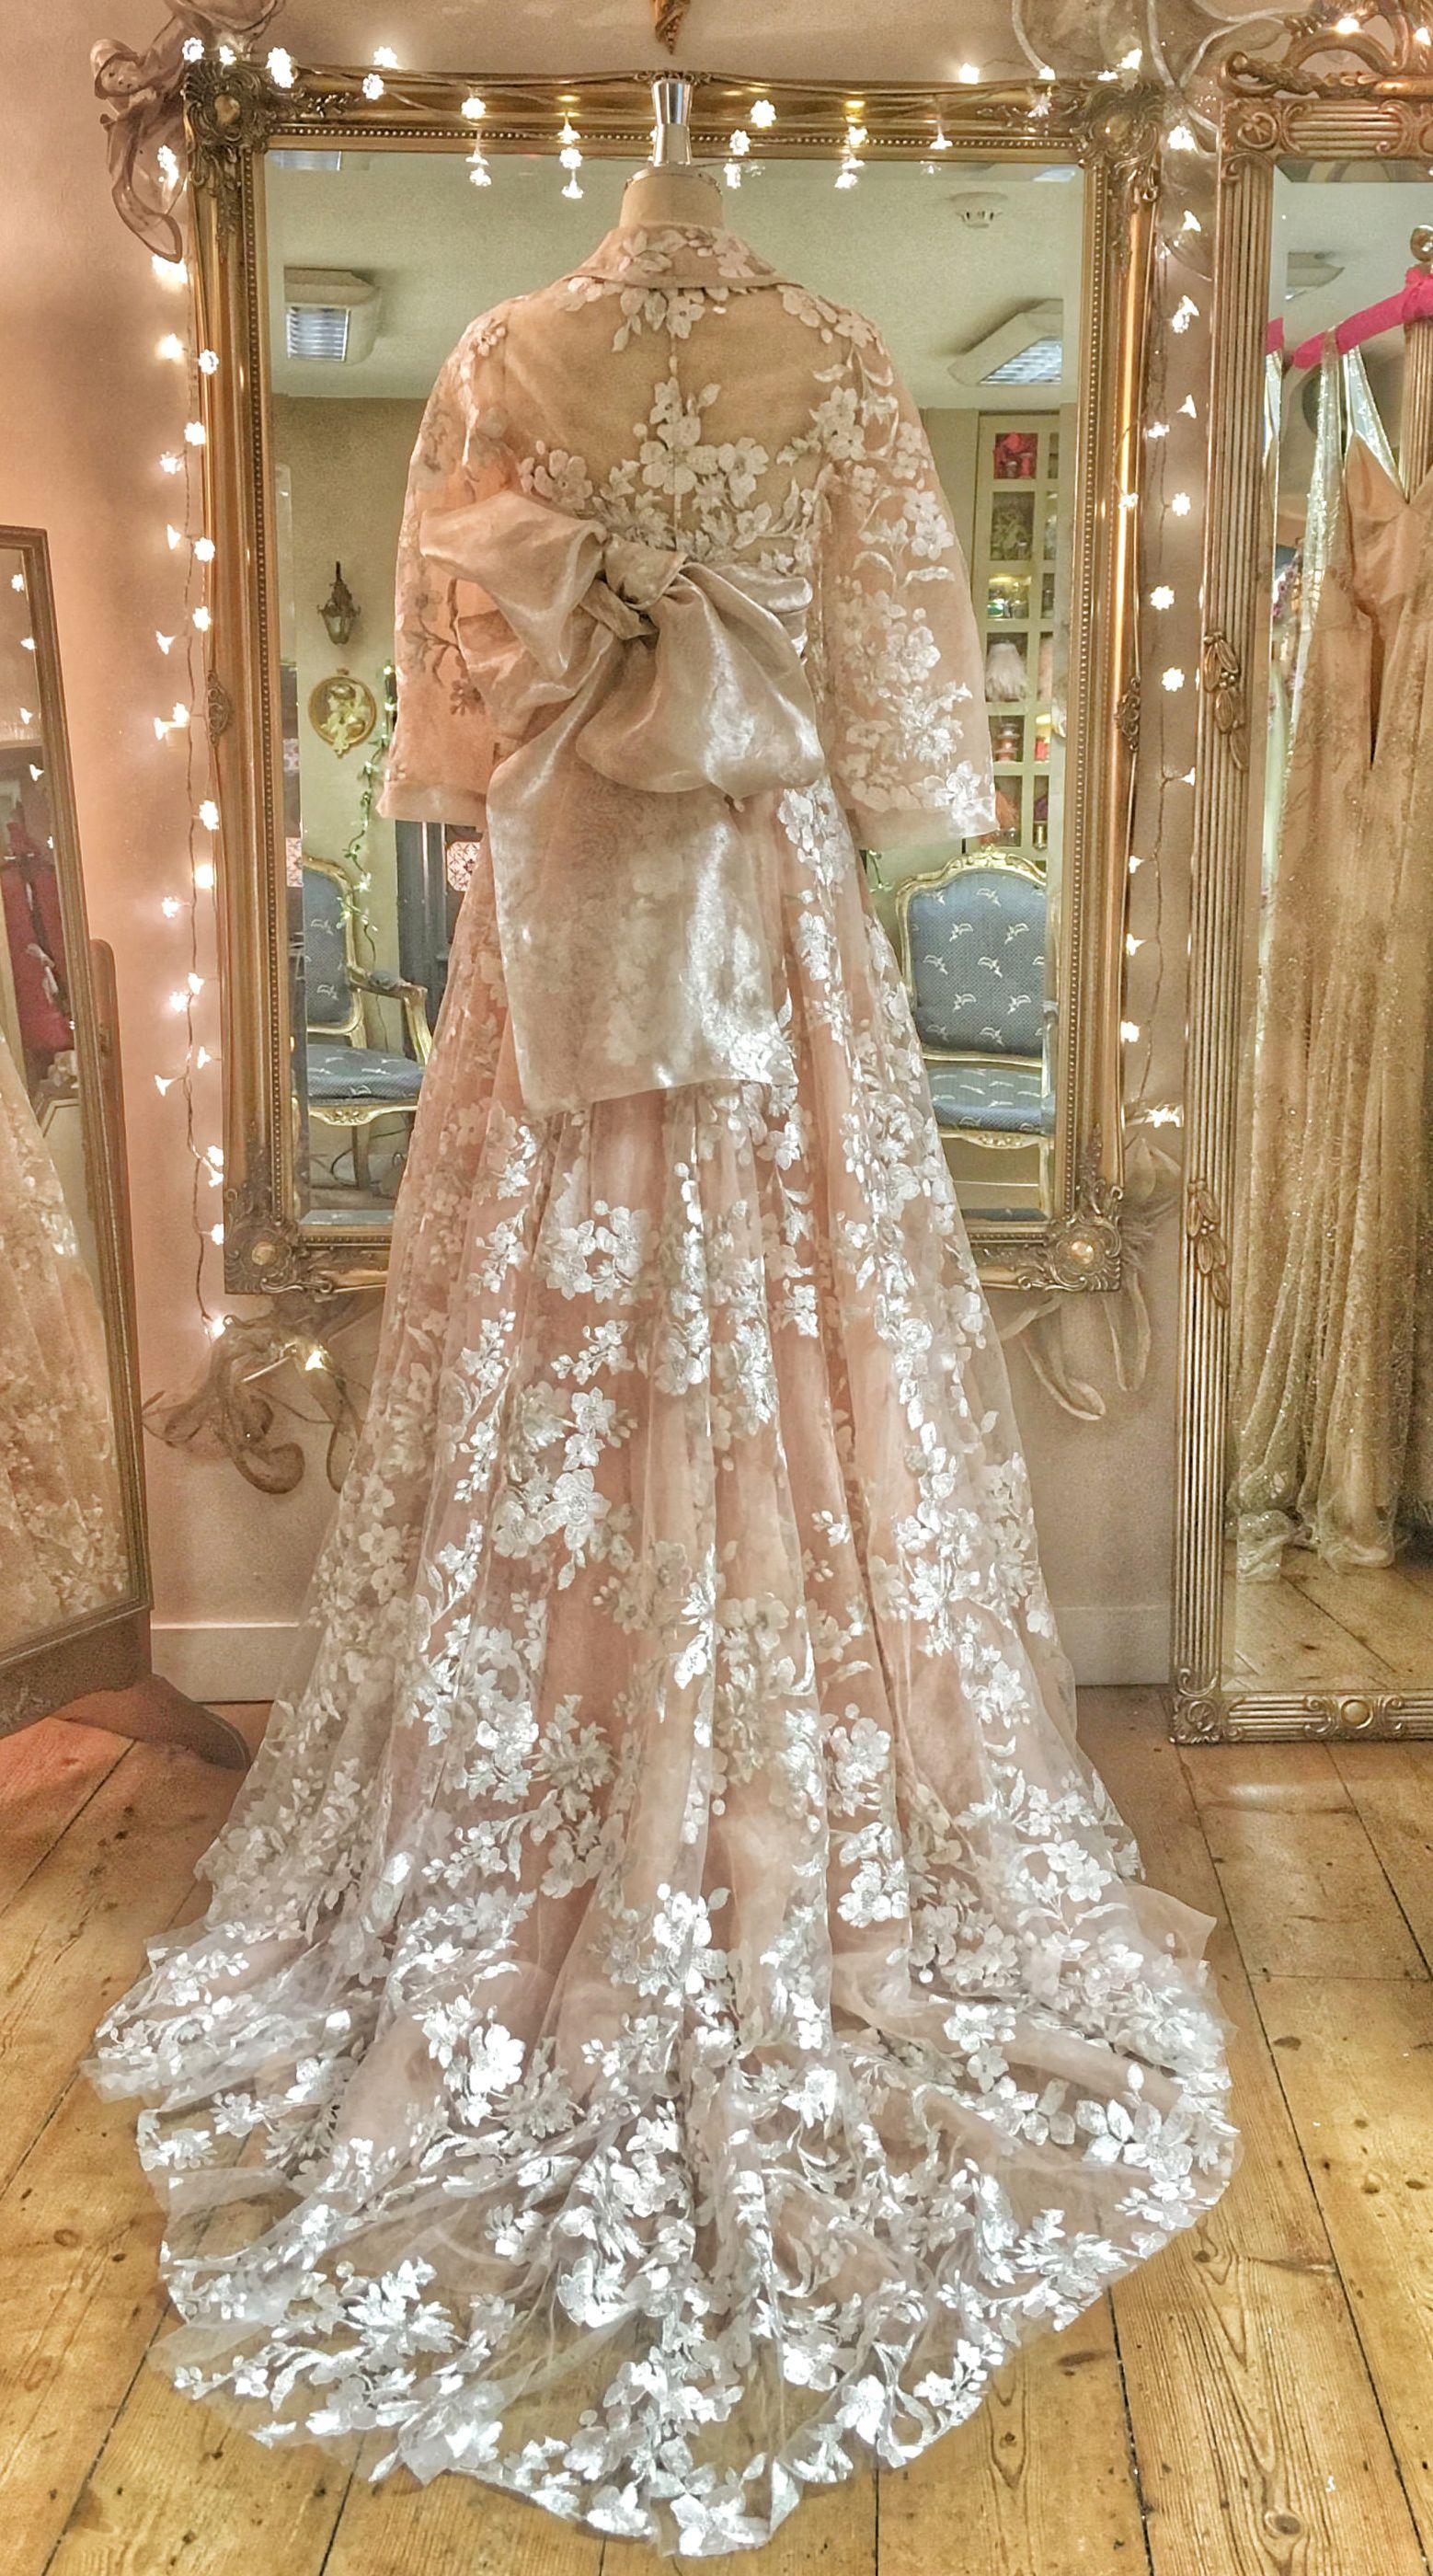 Park Art|My WordPress Blog_Cherry Blossom Dress Royale High